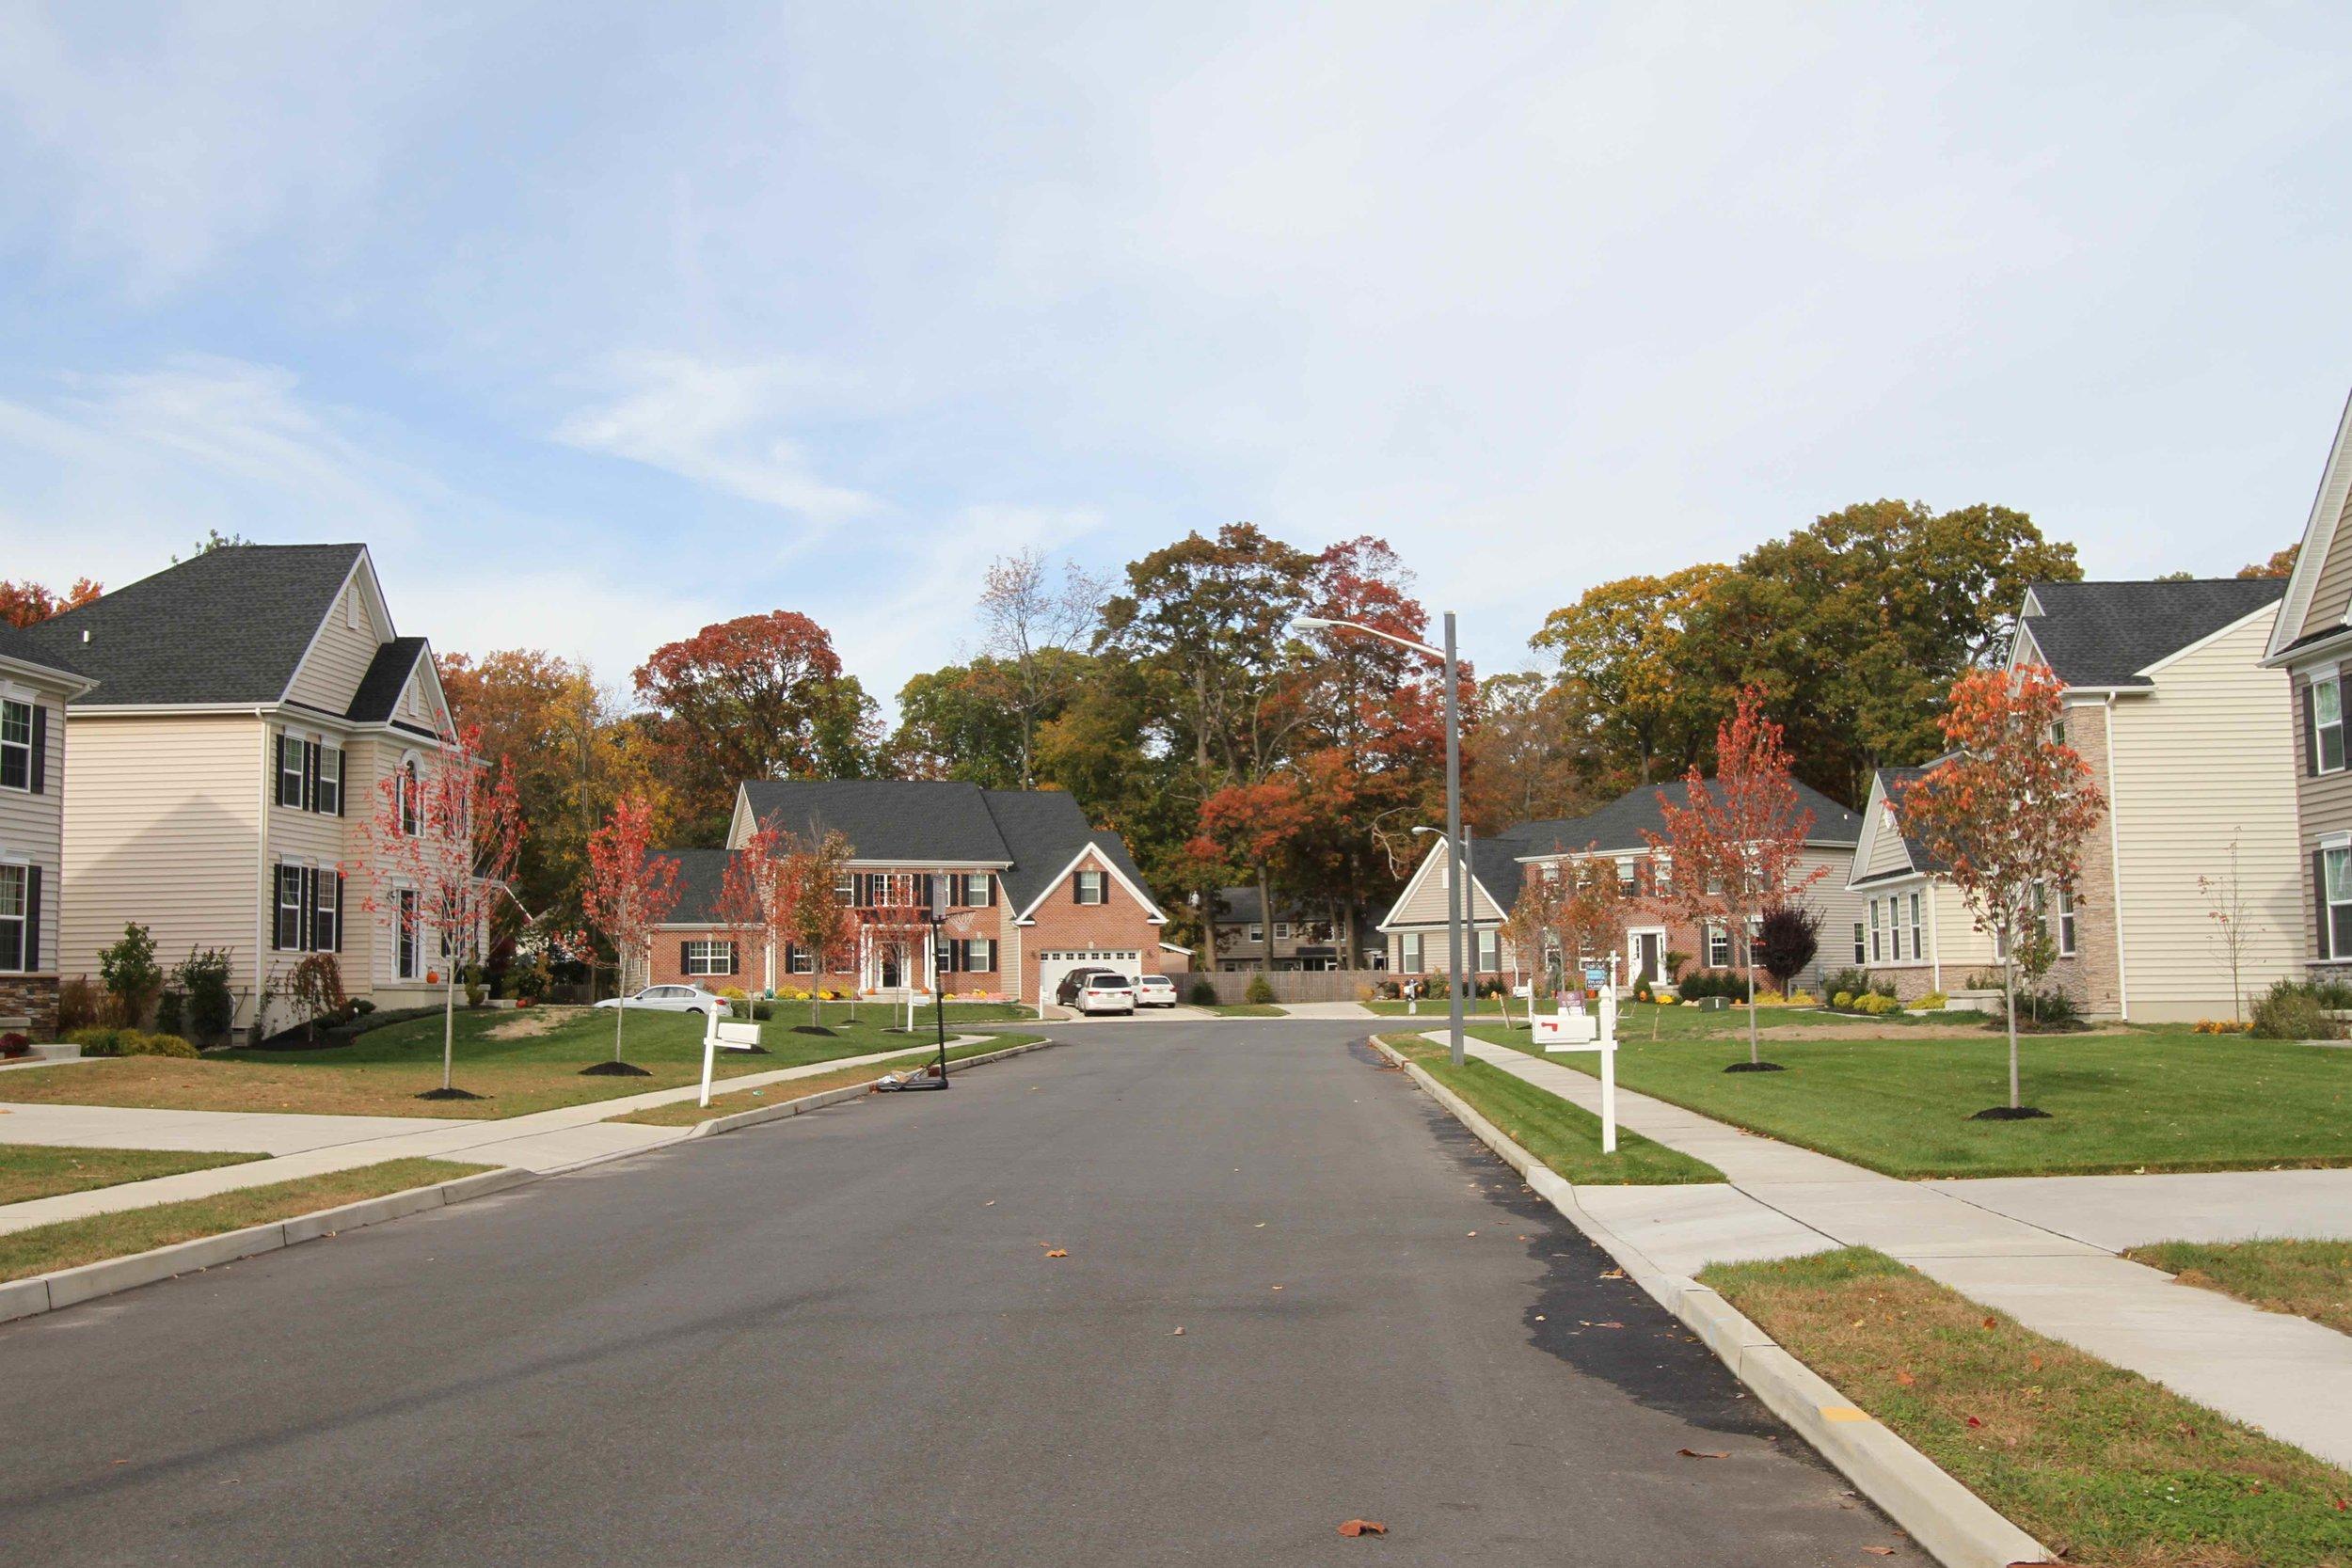 The suburban model of development